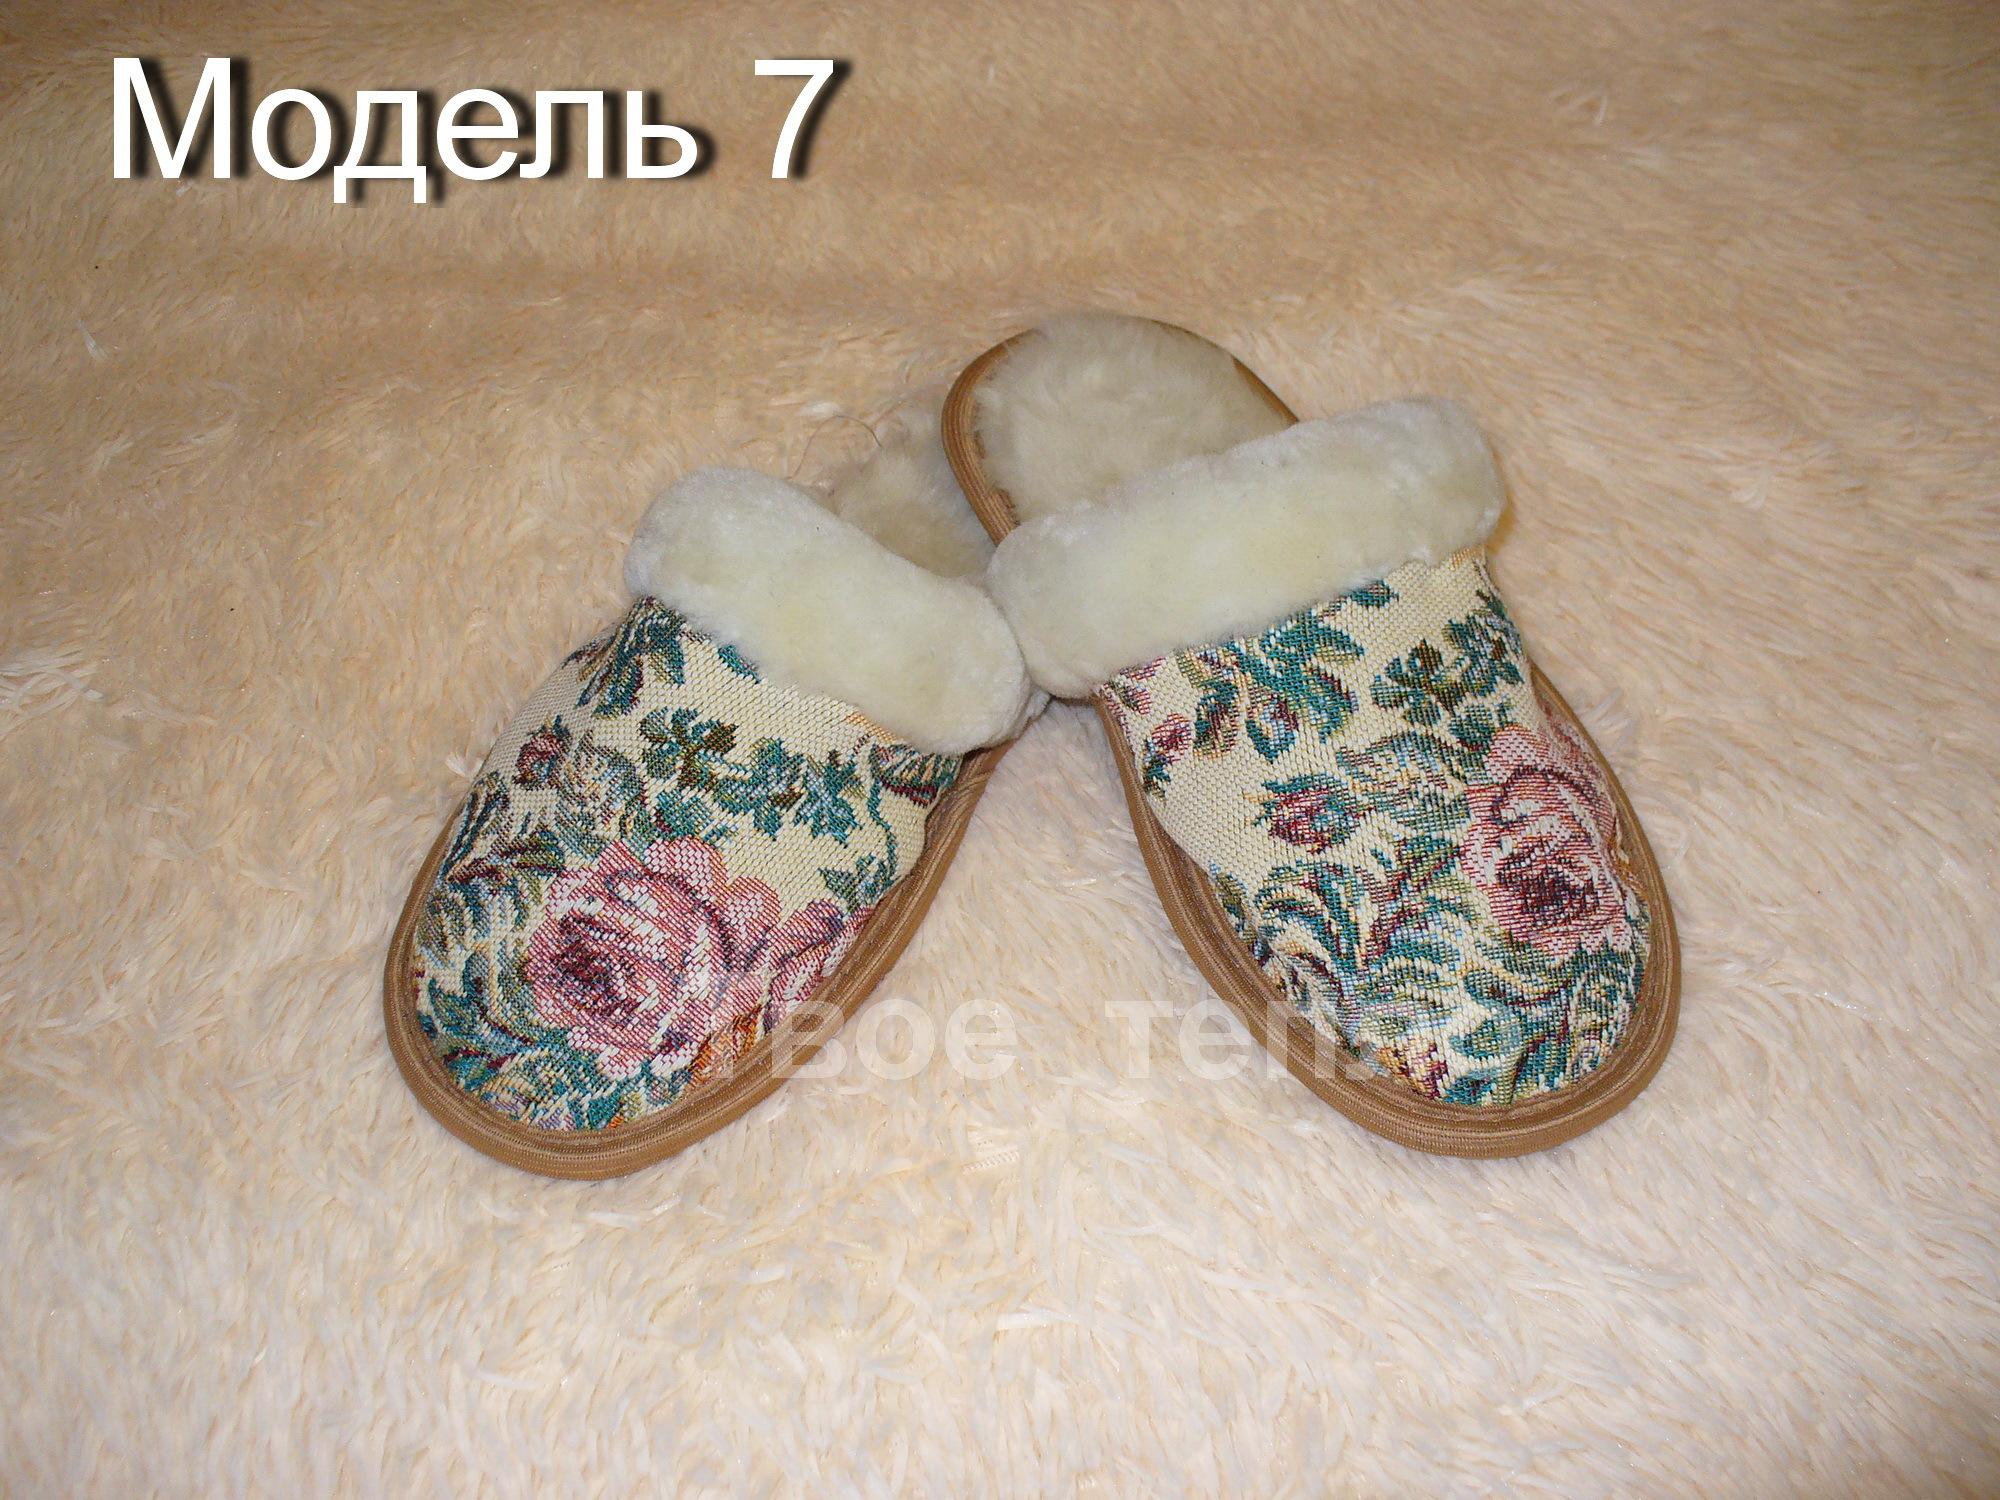 Женские тапочки шлепки с гобеленом